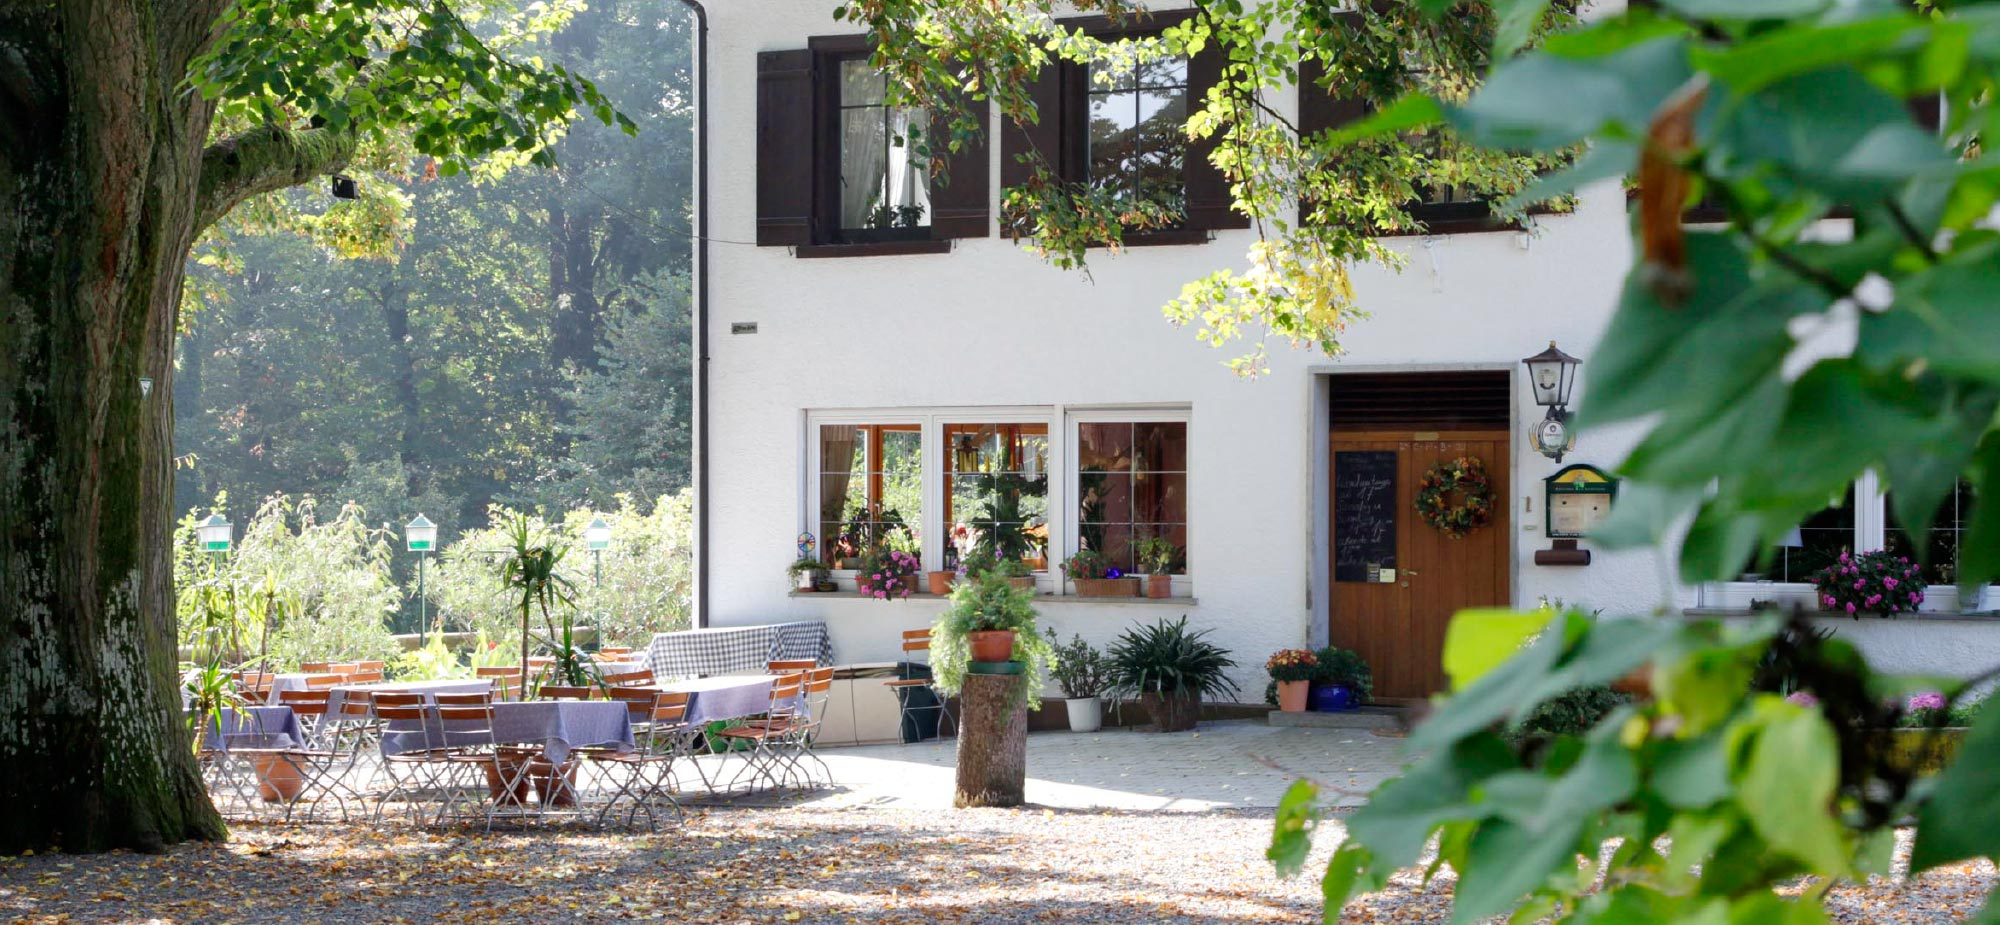 Lumperhof_Ravensburg_1